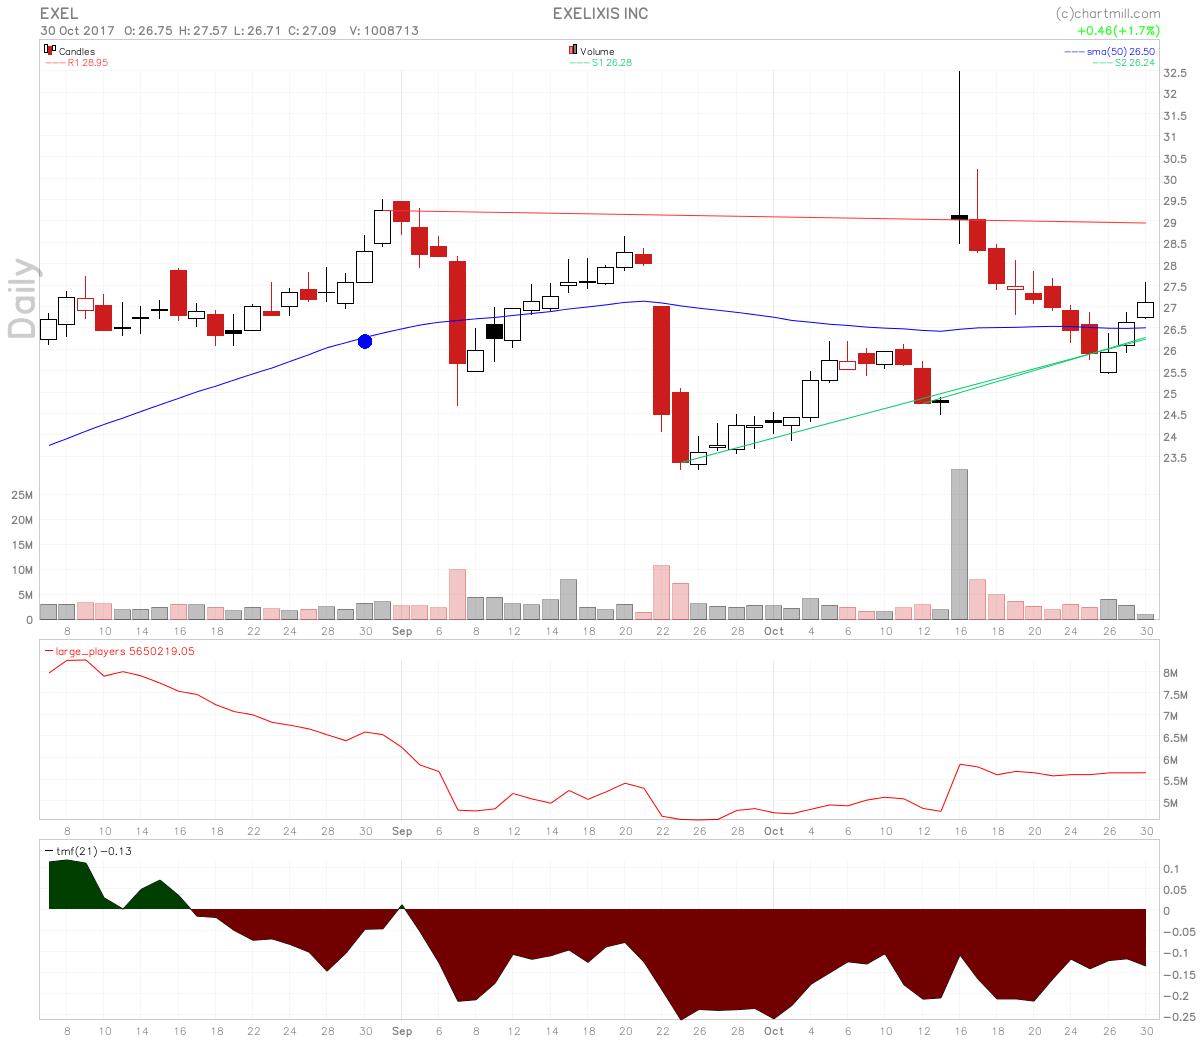 Exelixis stock looks like a good swing long setup.